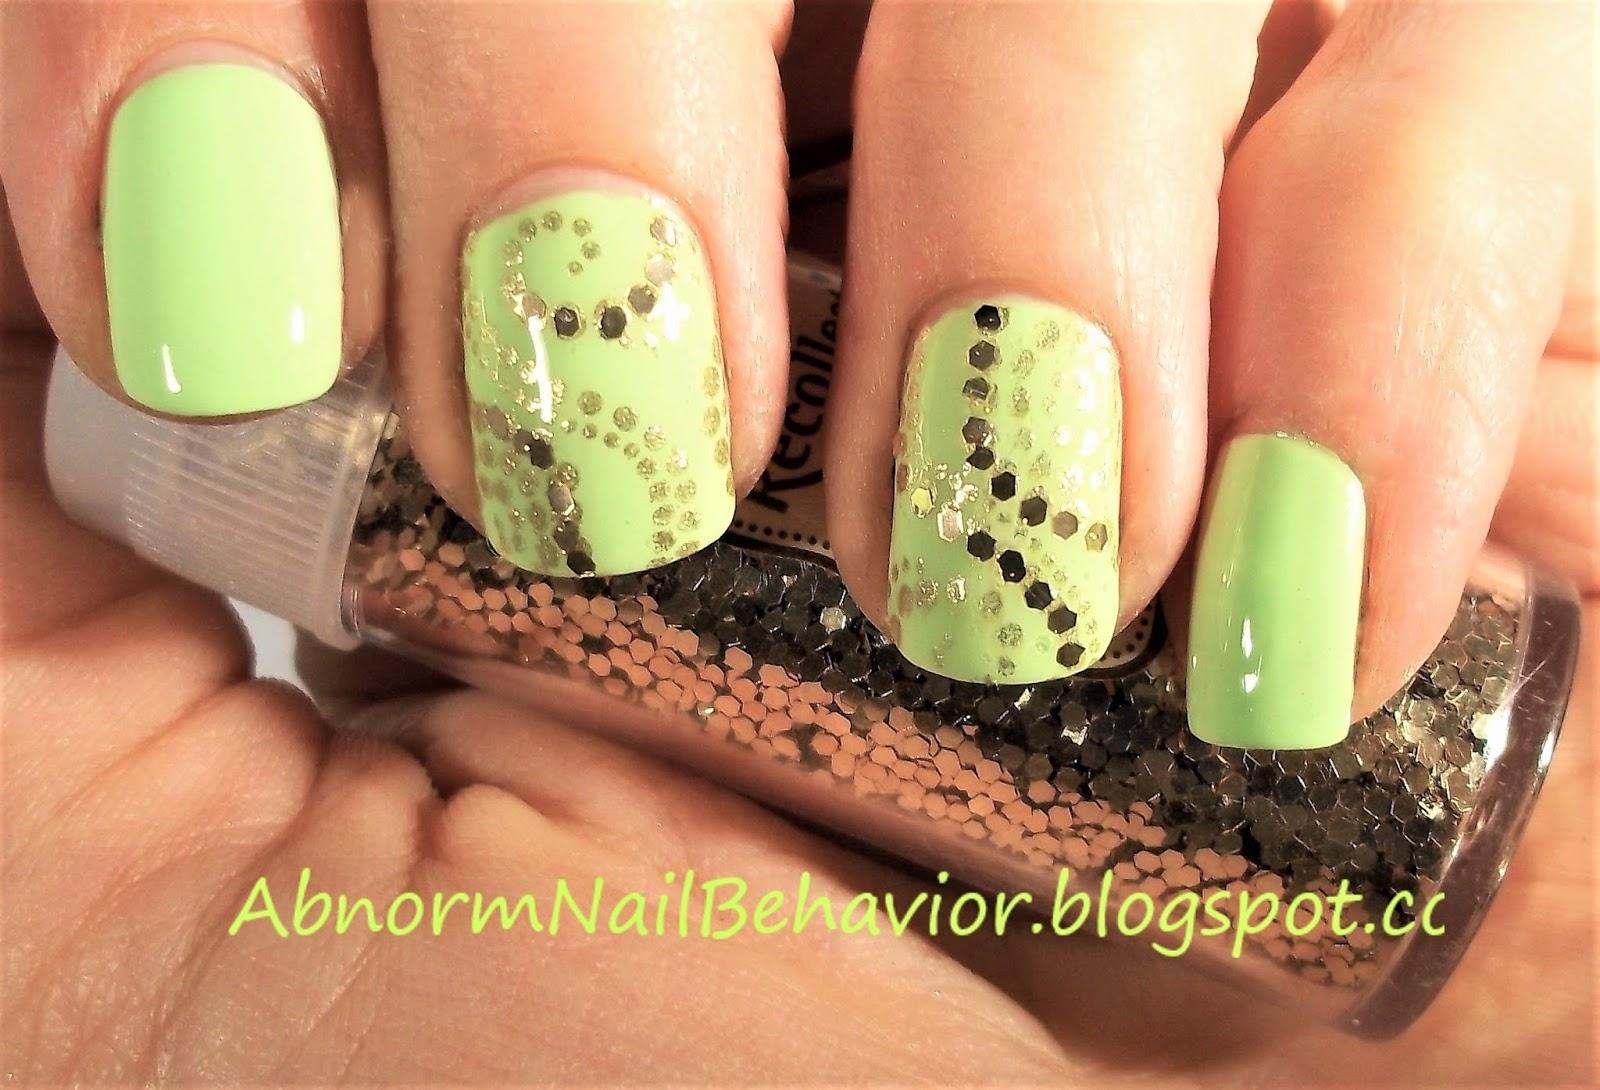 Abnorm Nail Behavior | Nail Art : Simple St Patrick\'s Day Nails